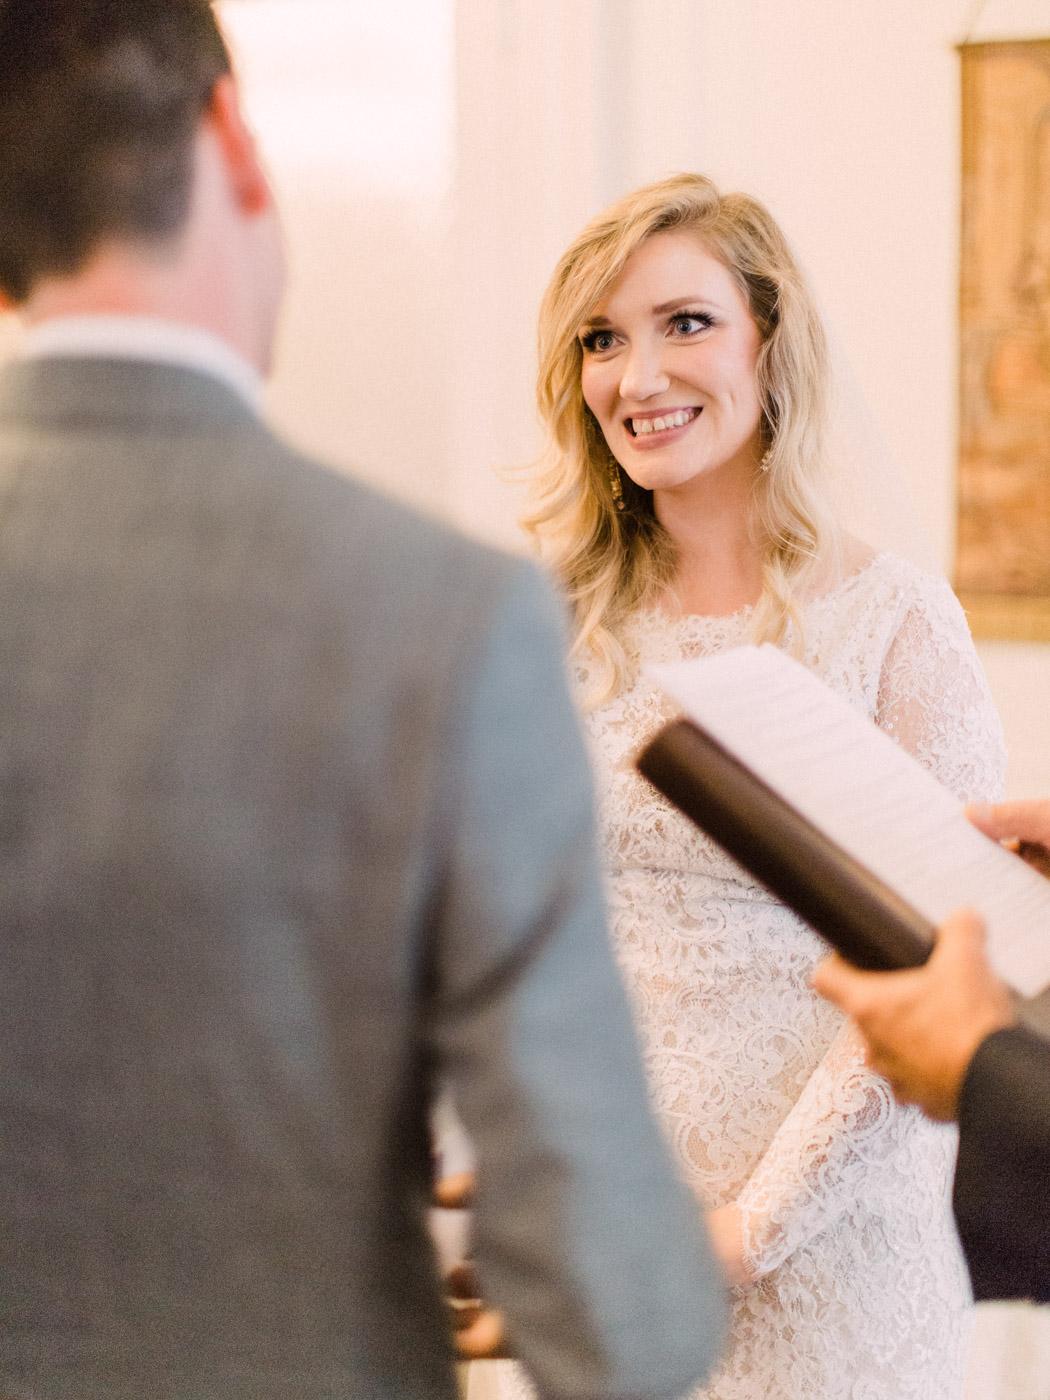 Toronto-wedding-photographer-intimate-classic-fine-art-elopement-ottawa30.jpg